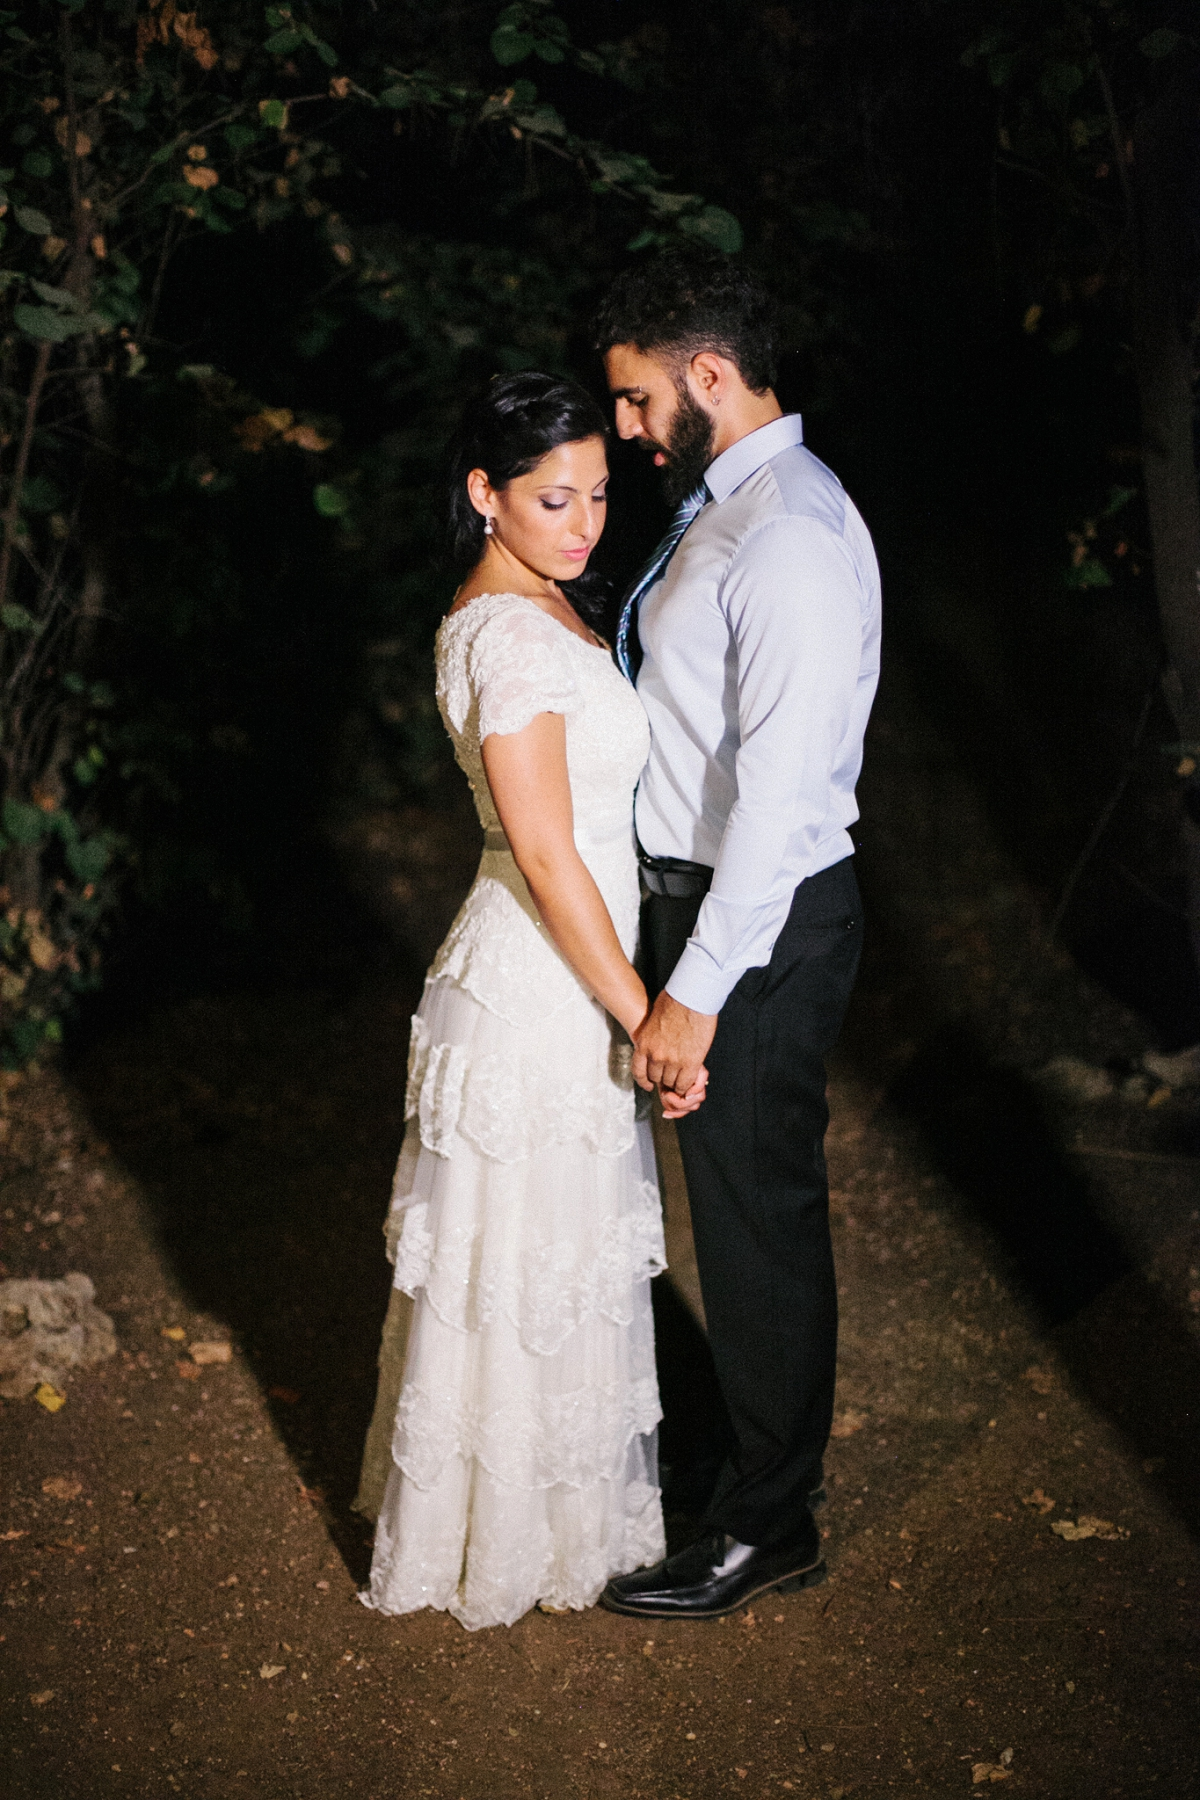 neot-kedumim-wedding-israel-shira-and-eilam-sigala-photography_0052